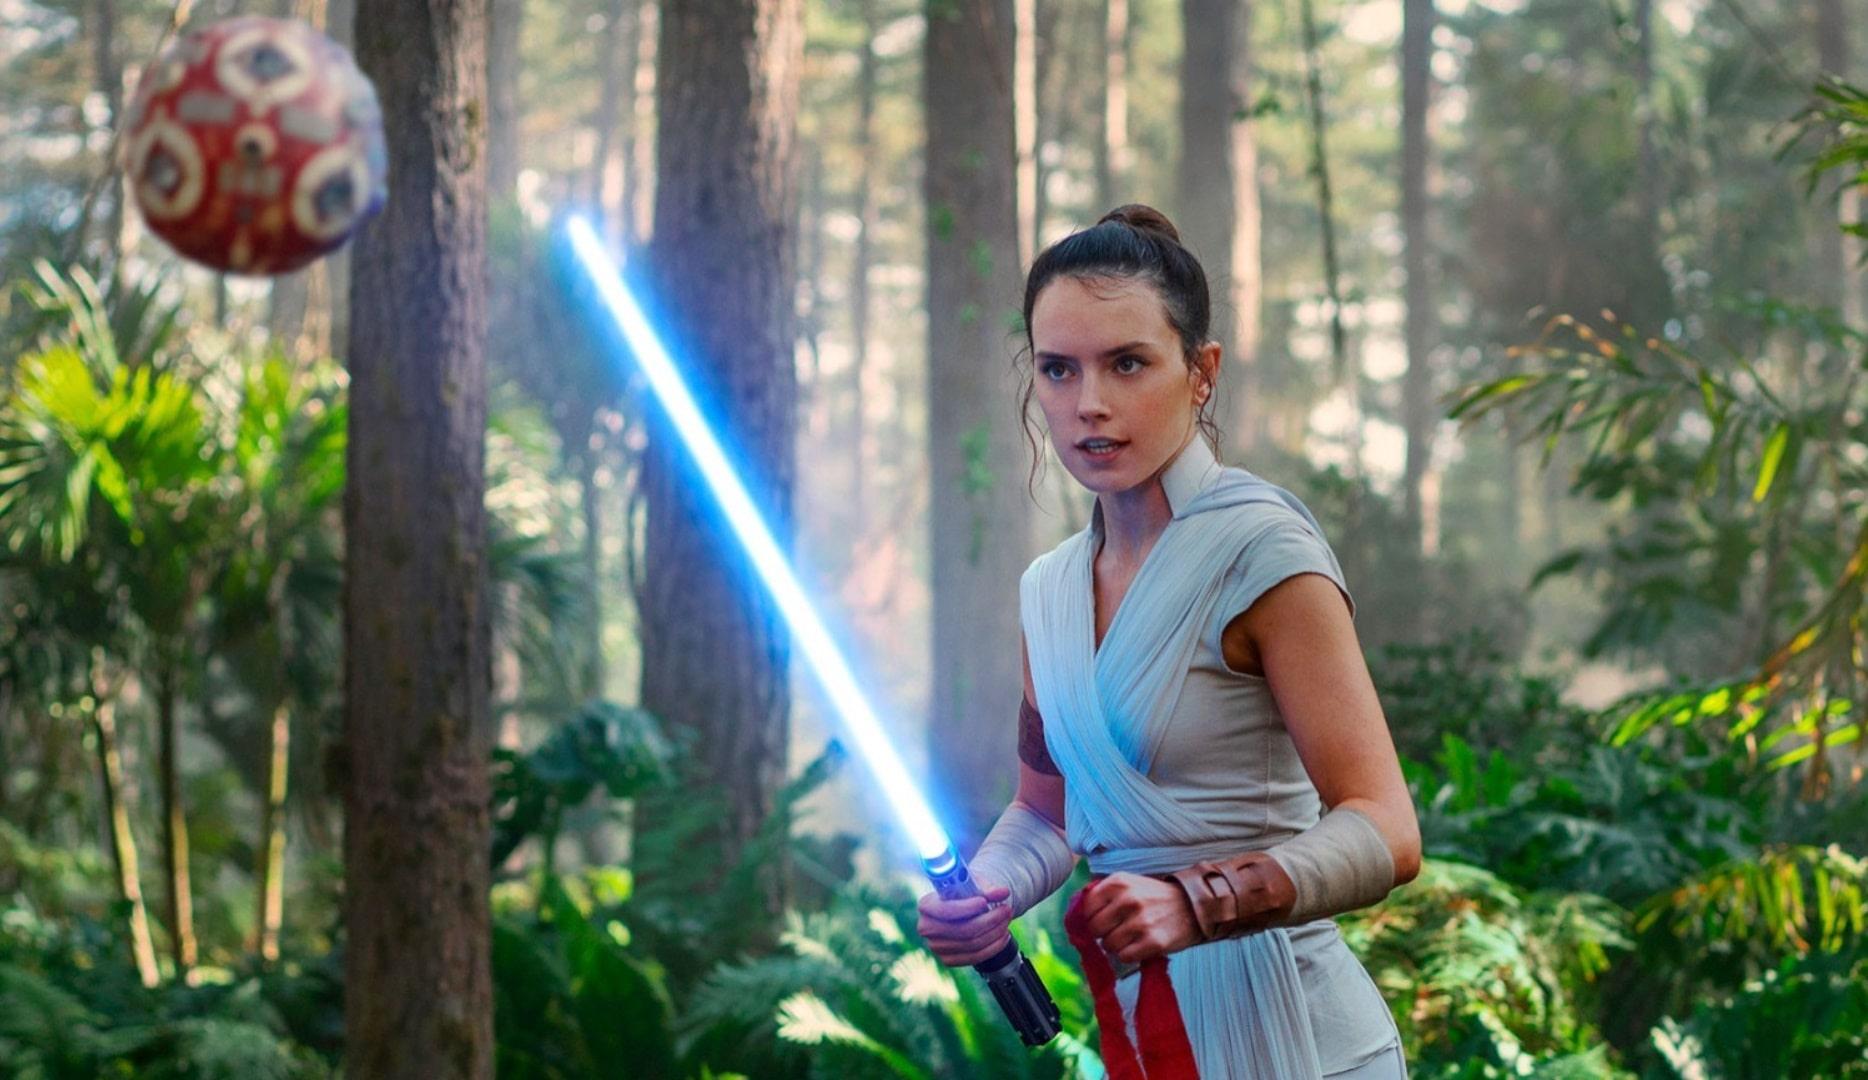 Звёздные войны: Скайуокер. Восход / Star Wars: Episode IX – The Rise of Skywalker (2019): кадр из фильма